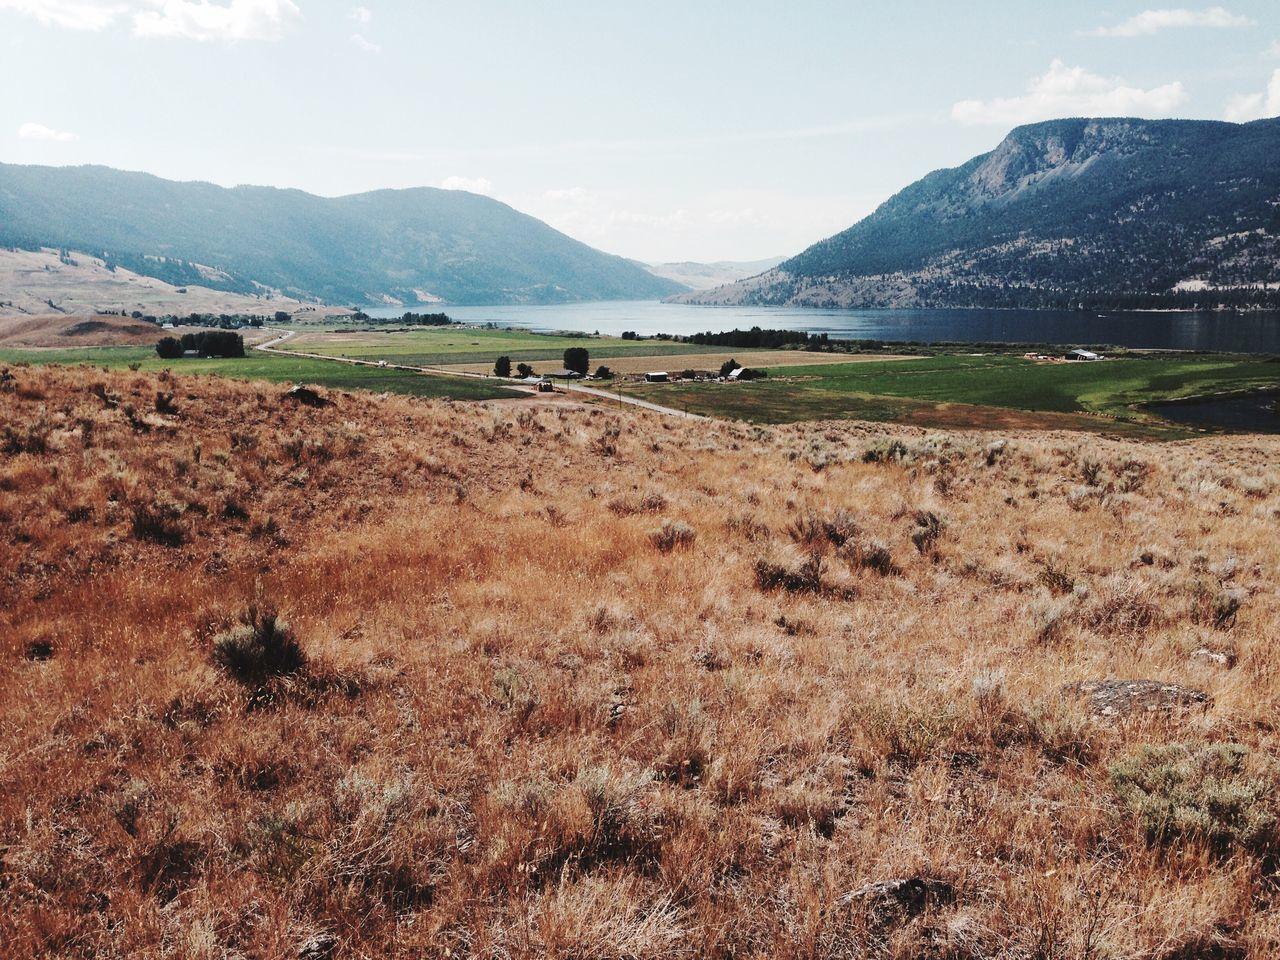 Nicola Lake Nicola Valley British Columbia Nature Landscape Cowboy Country